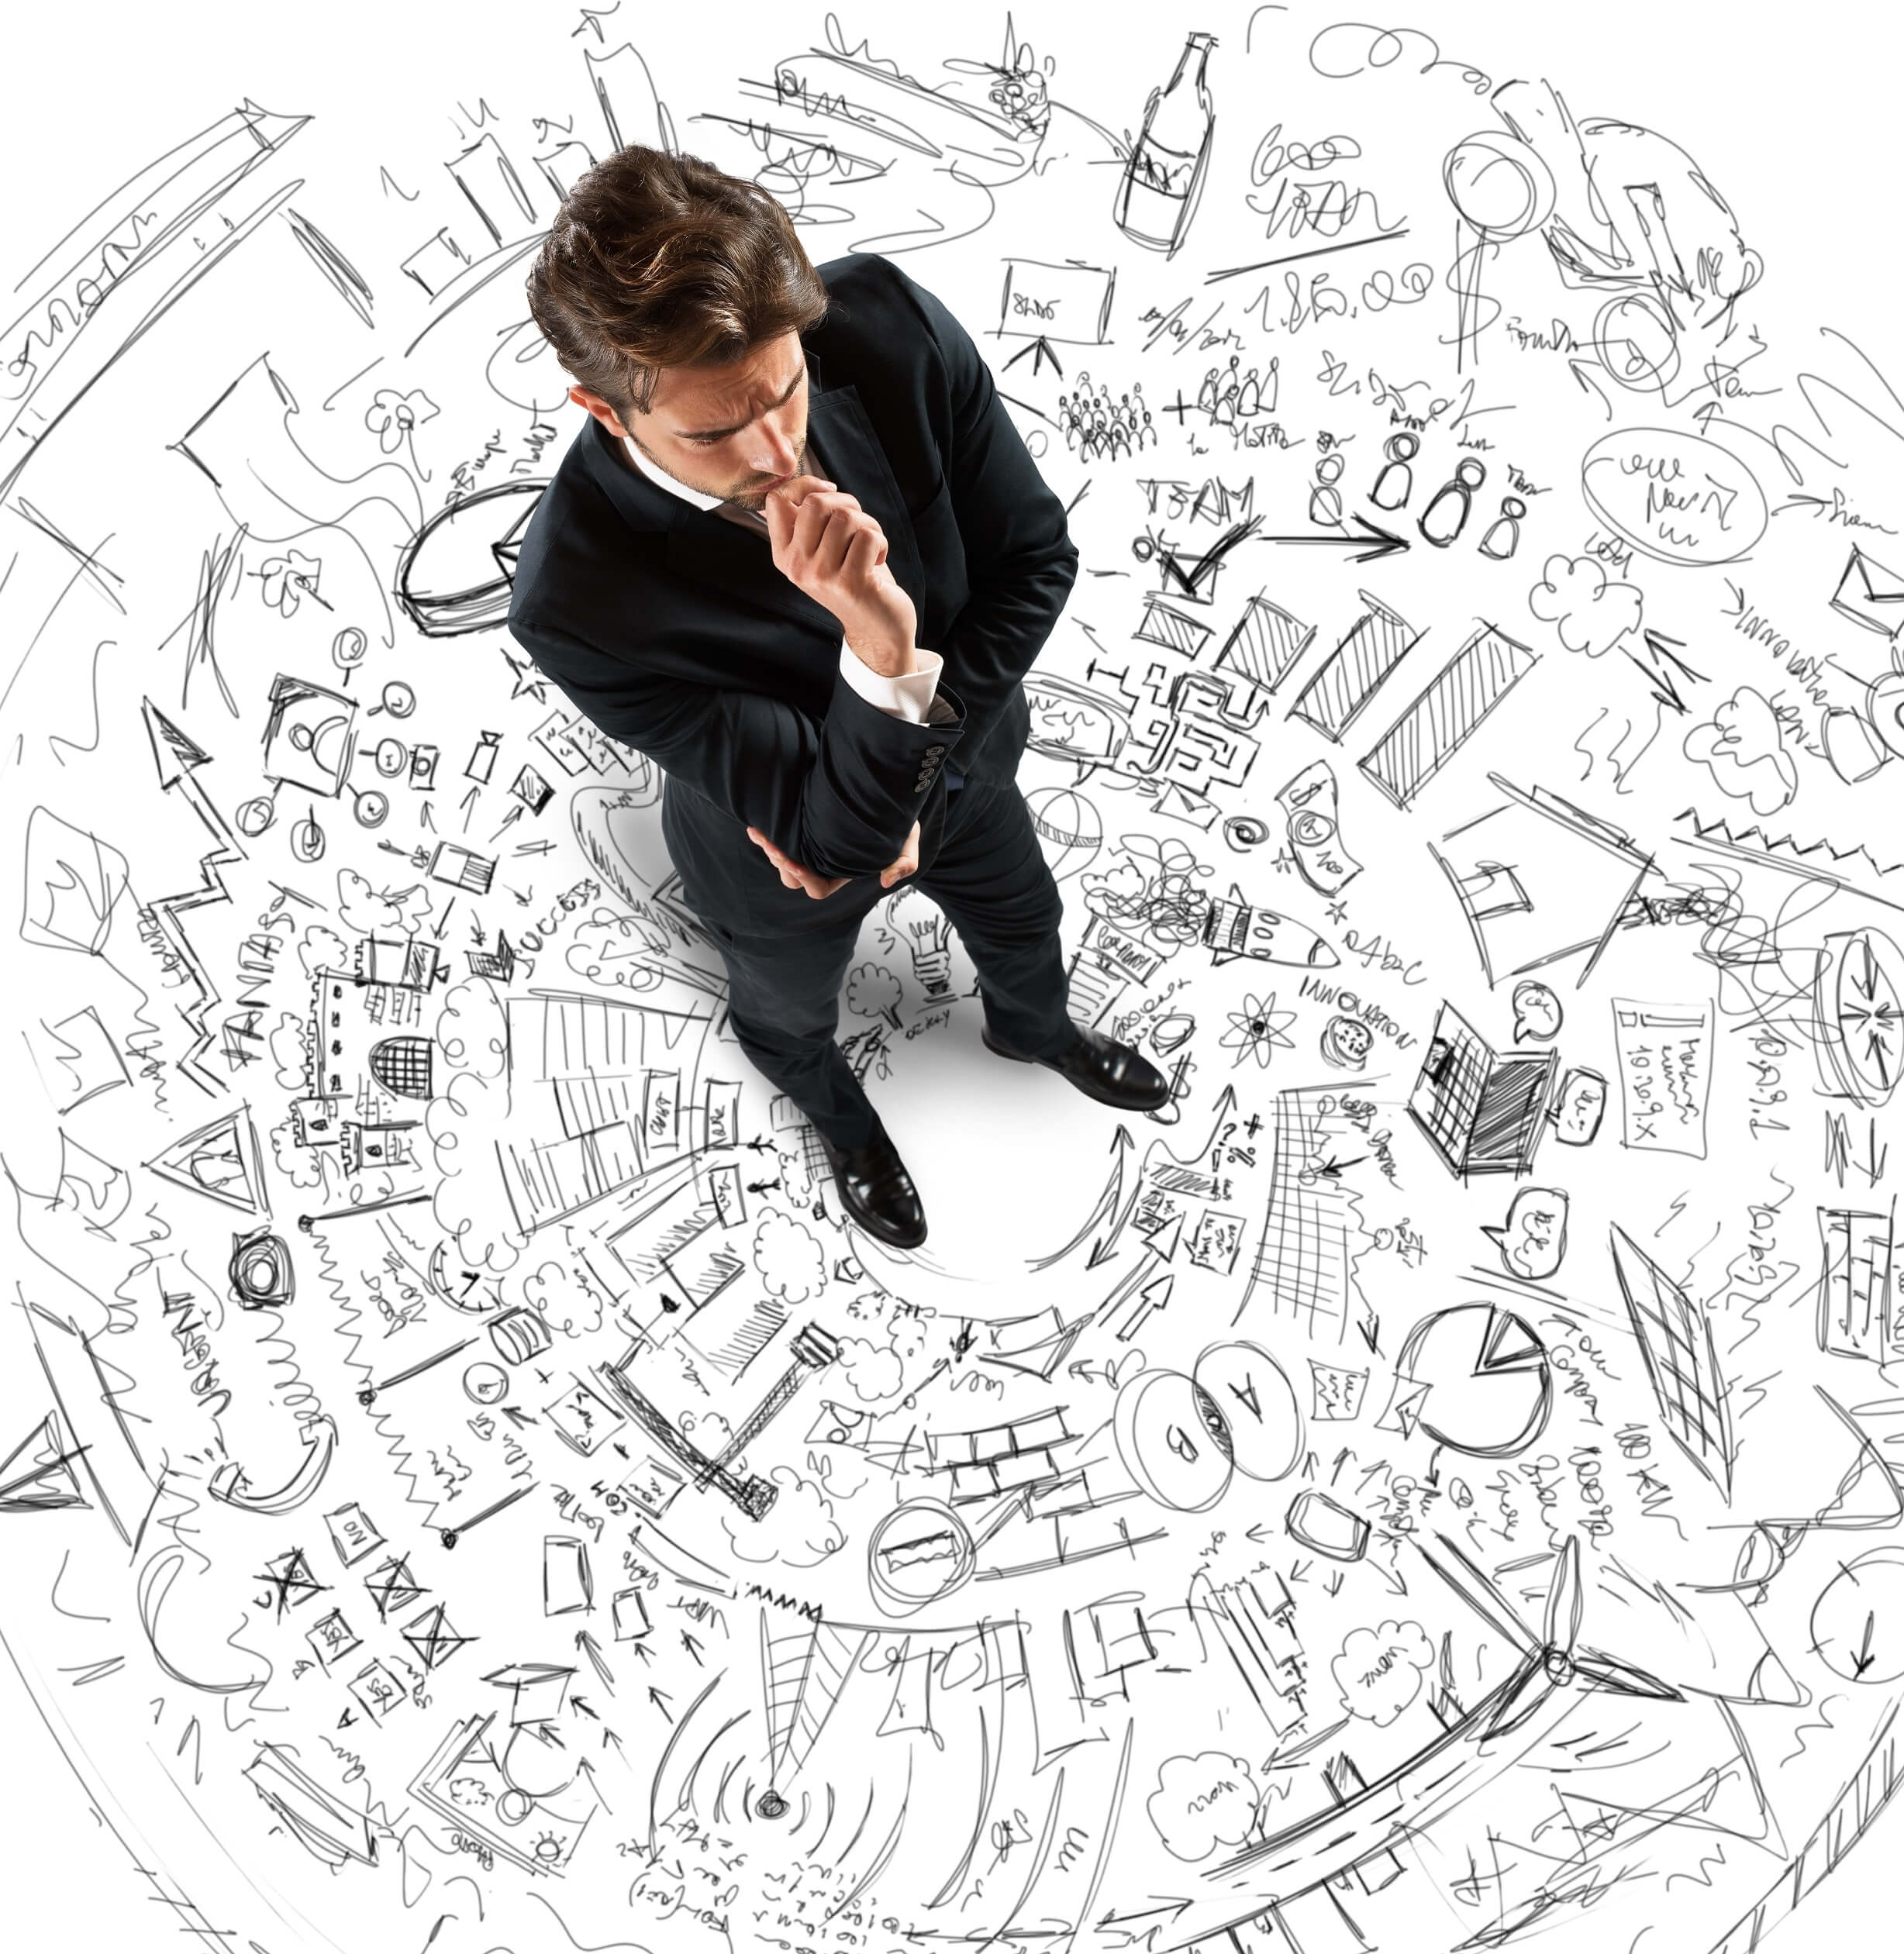 Trucs & Astuces - Décisions, décisions, décisions